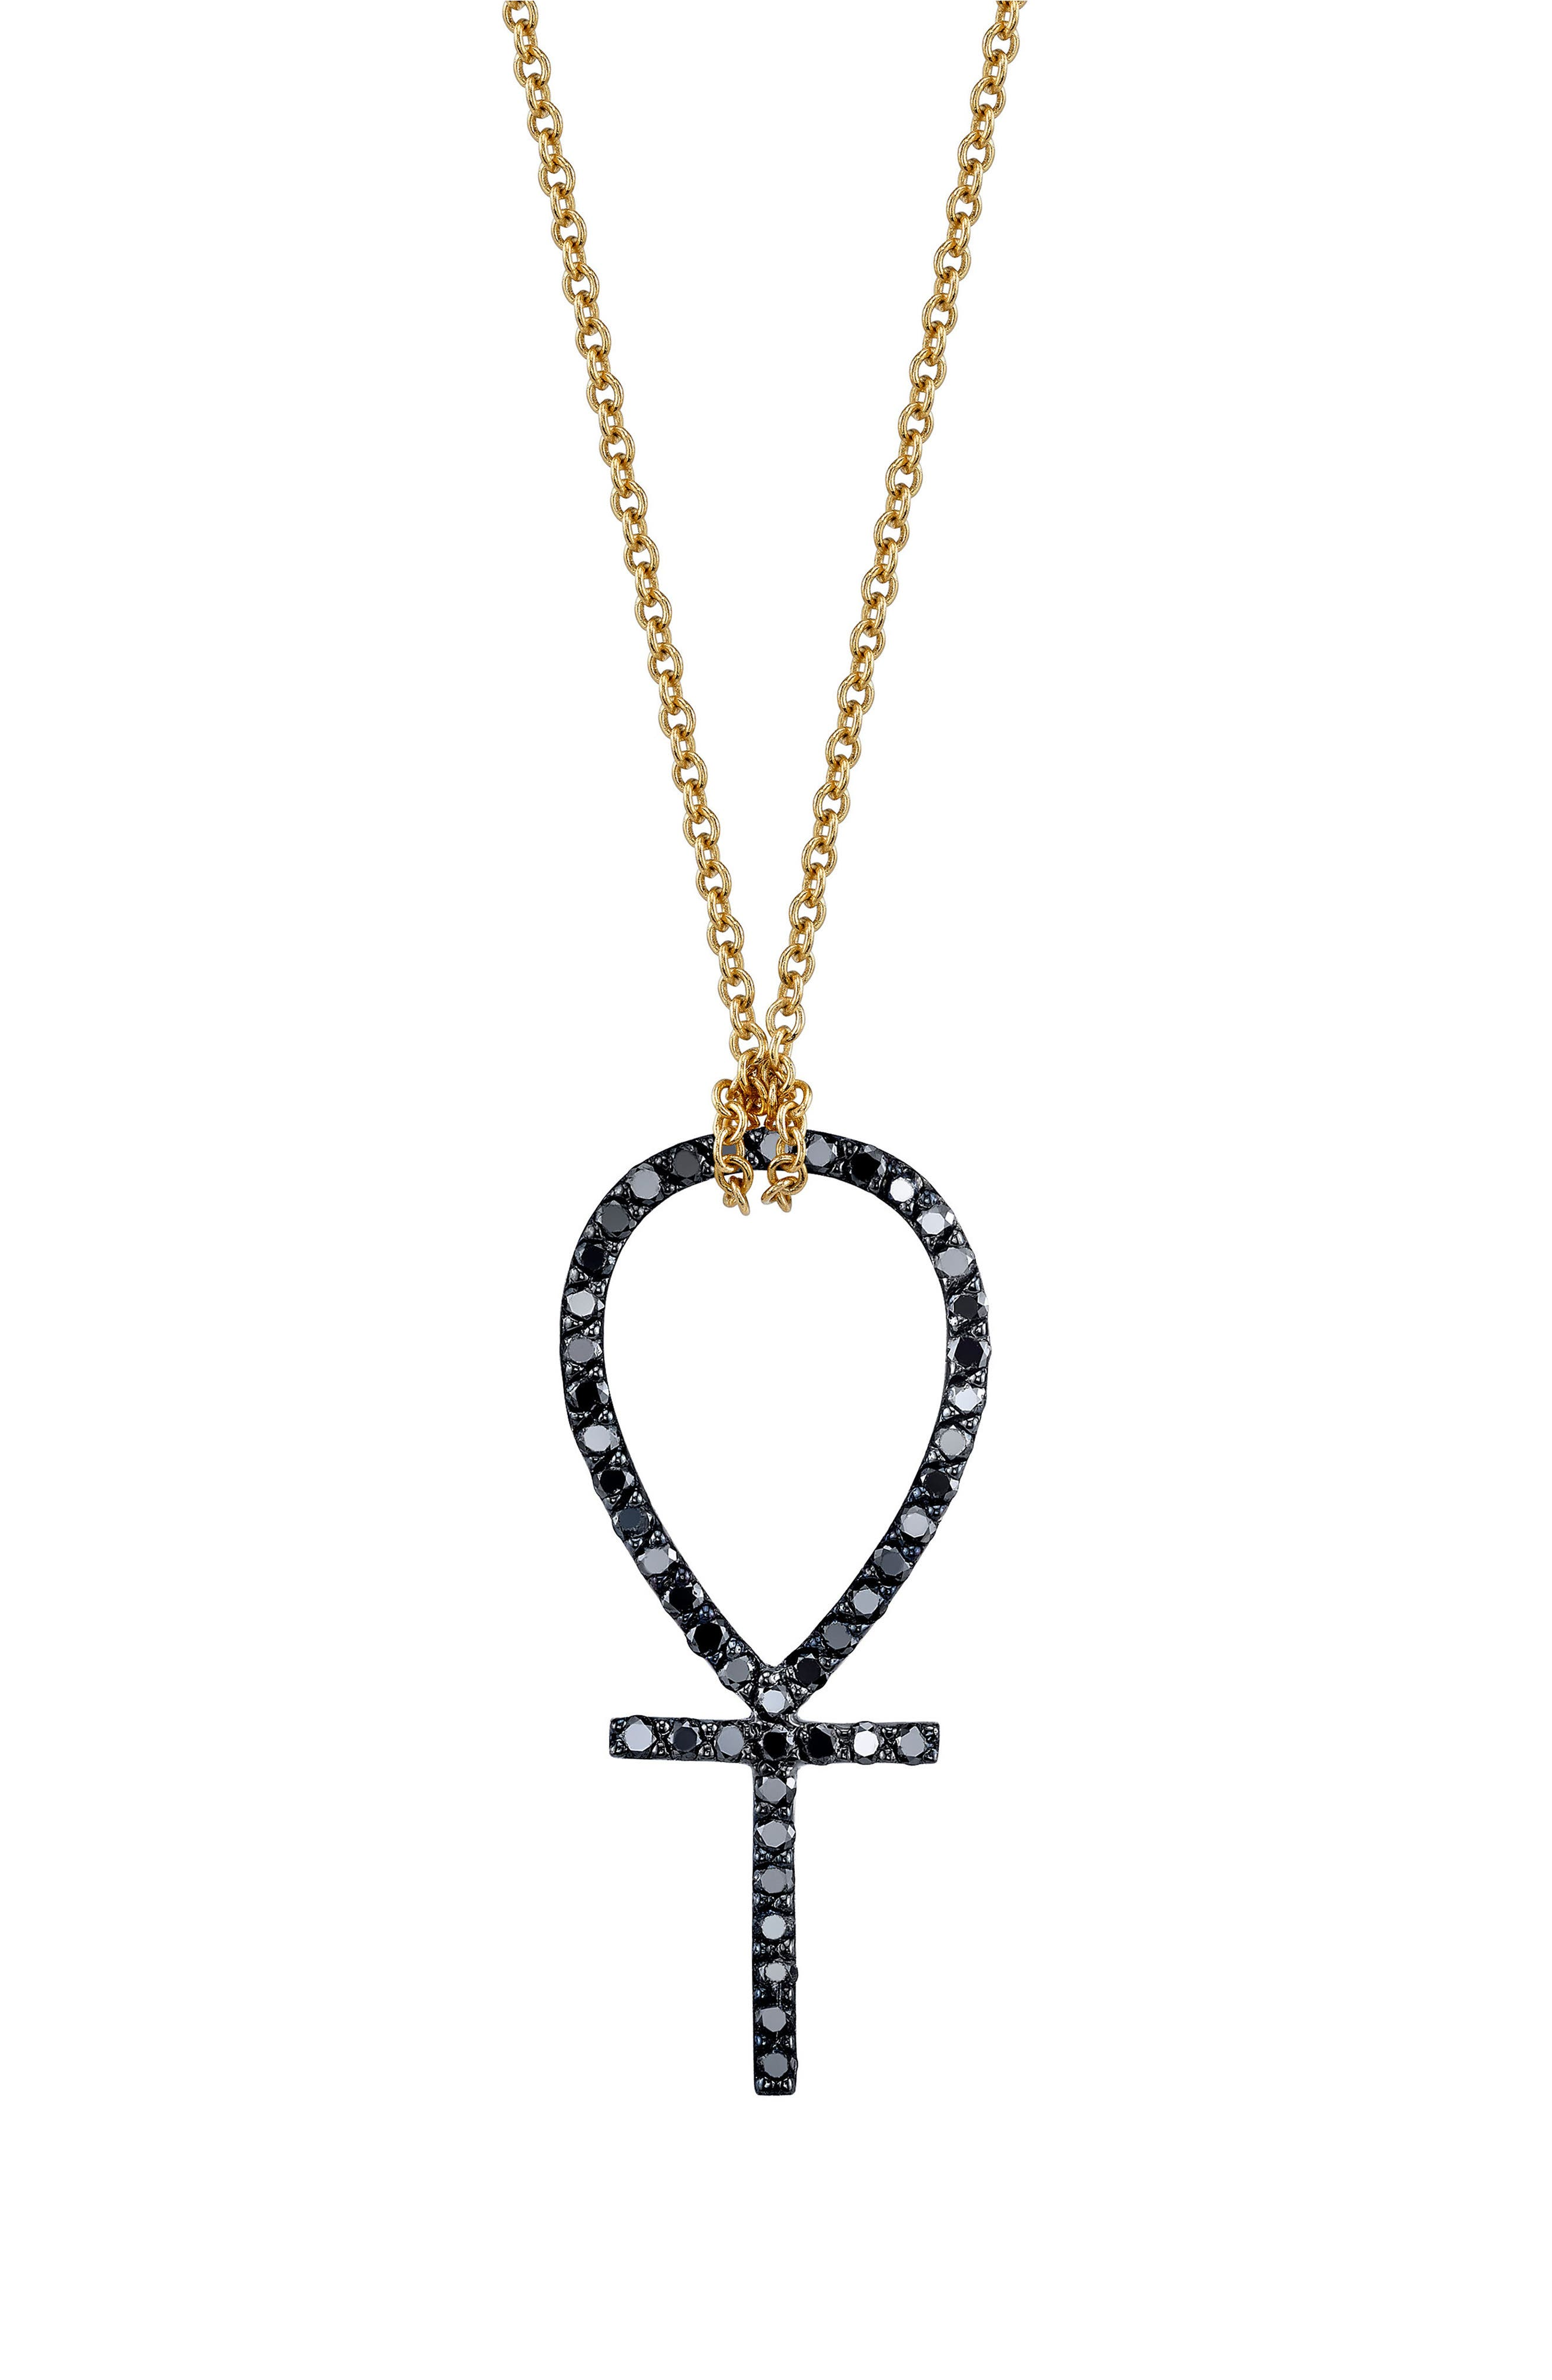 x Rashida Jones Black Diamond Ankh Pendant Necklace,                         Main,                         color, Yellow Gold